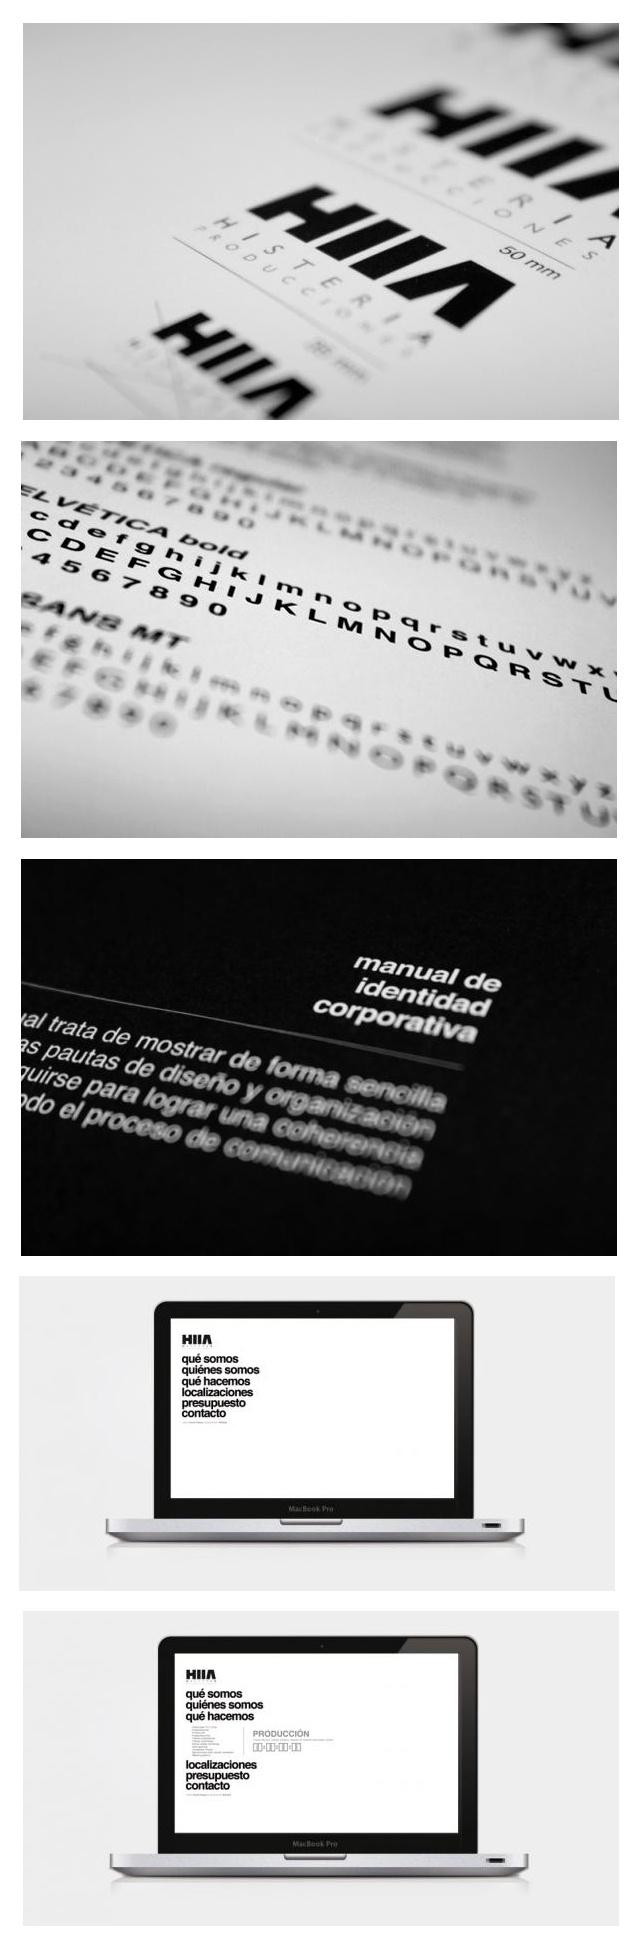 "Desarrollo imagen corporativa (Logotipo, manual de identidad corporativa, diseño web) para la productora audiovisual ""Histeria Producciones"". #branding #identity #design #graphicdesign #brand #company #manual"